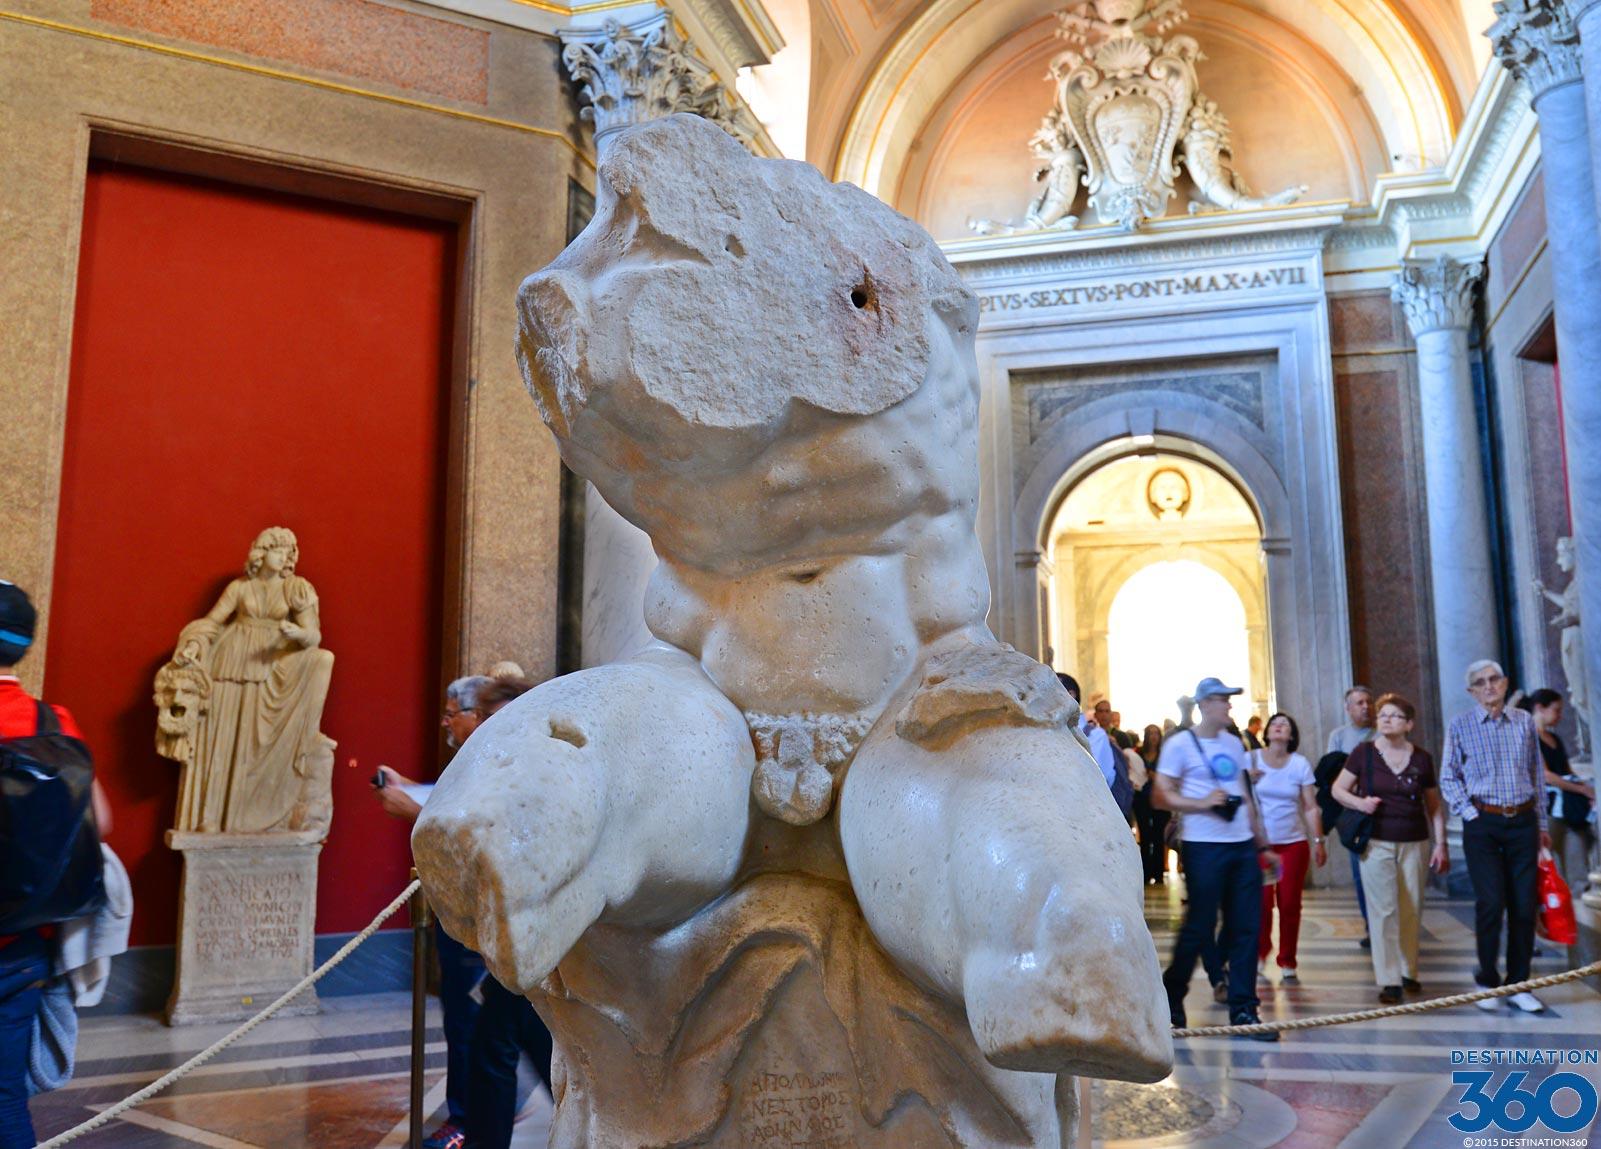 Roman Statues Ancient Roman Statues Roman Emperor Statues